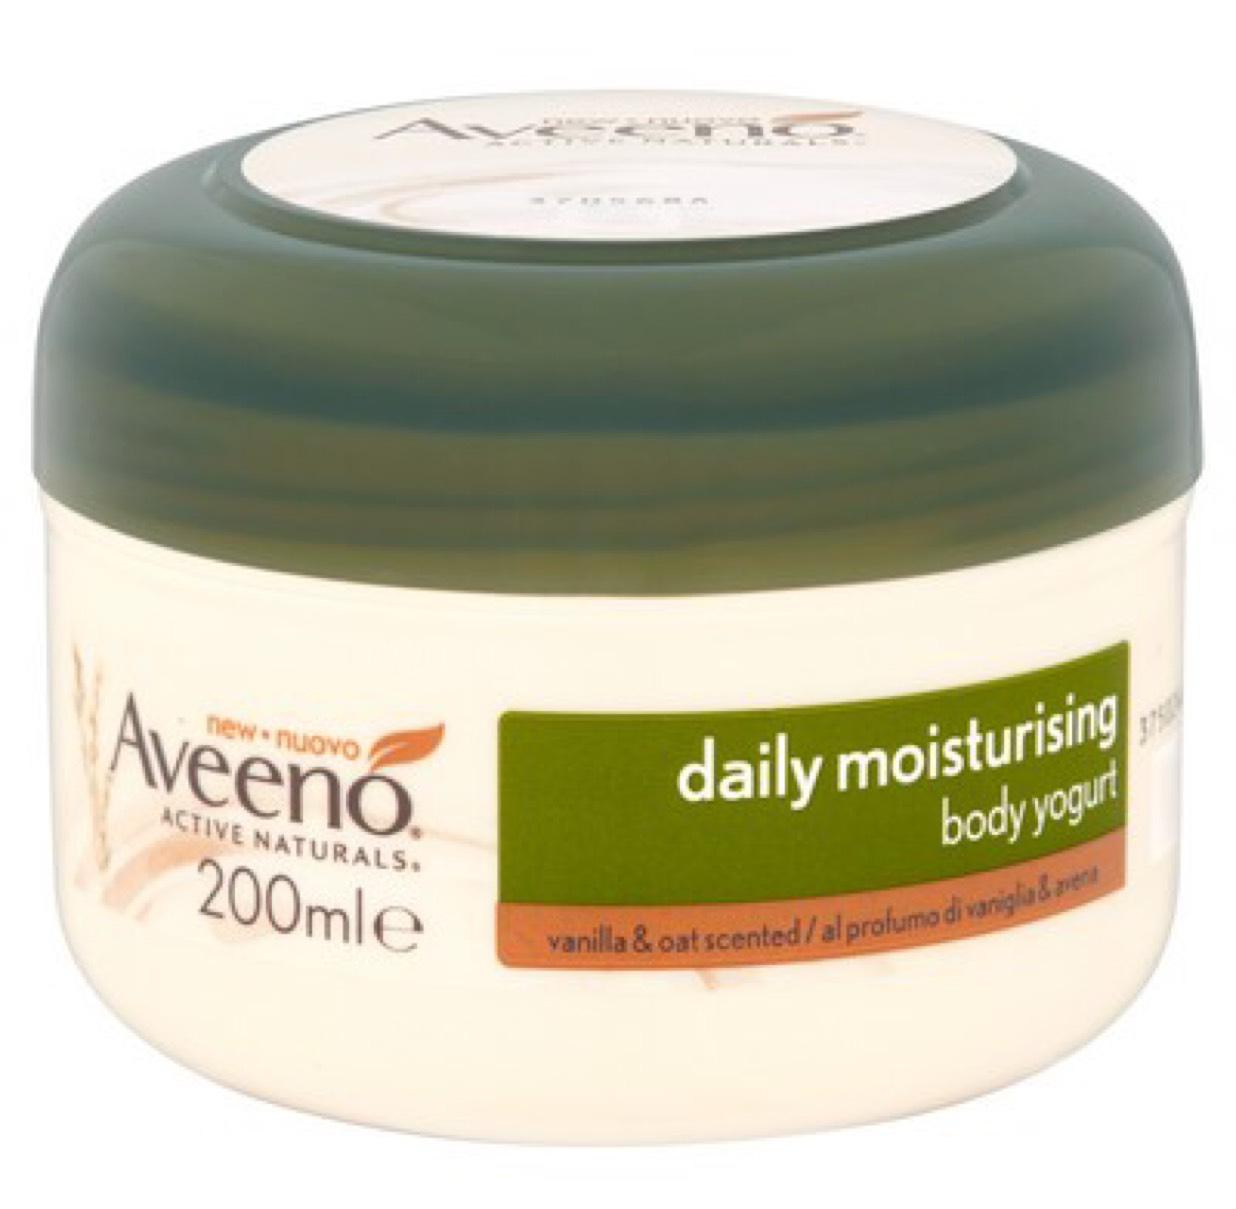 Aveeno Daily Moisturising Vanilla and Oat scented body yogurt was £6.50 now £3.25 @ Lloyds